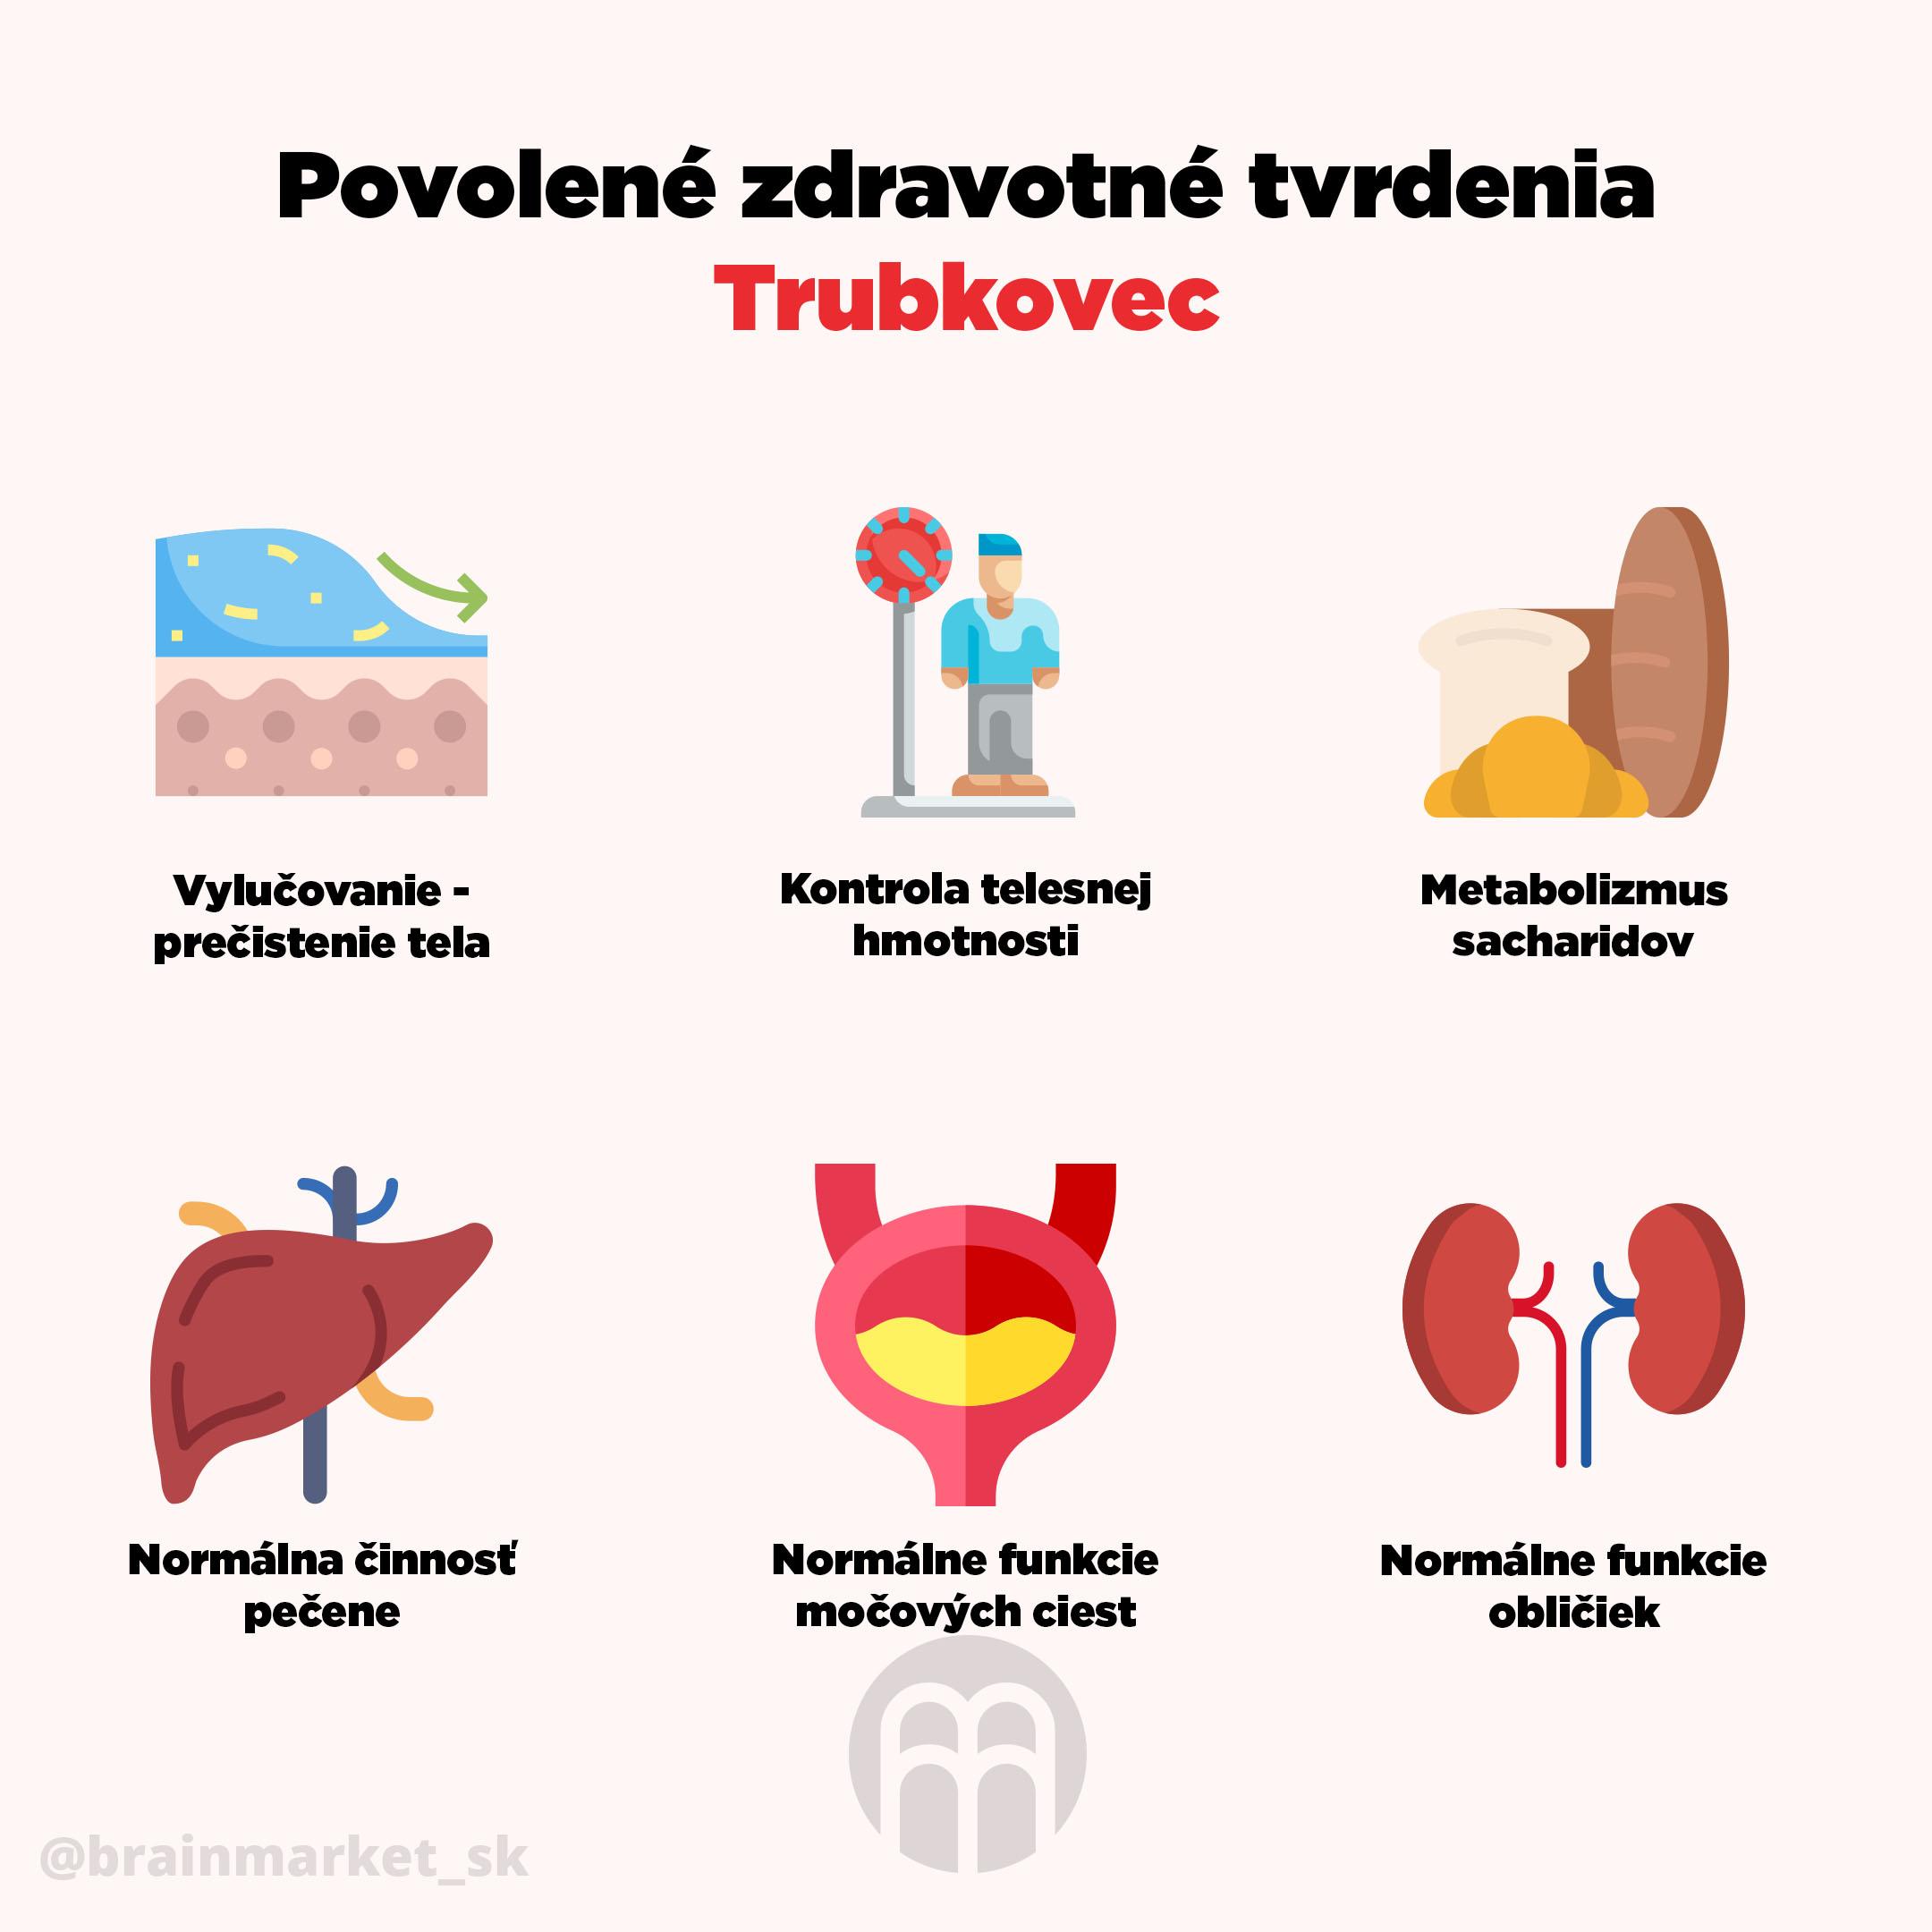 schvalena_tvrzeni_trubkovec_infografika_brainmarket_sk_1